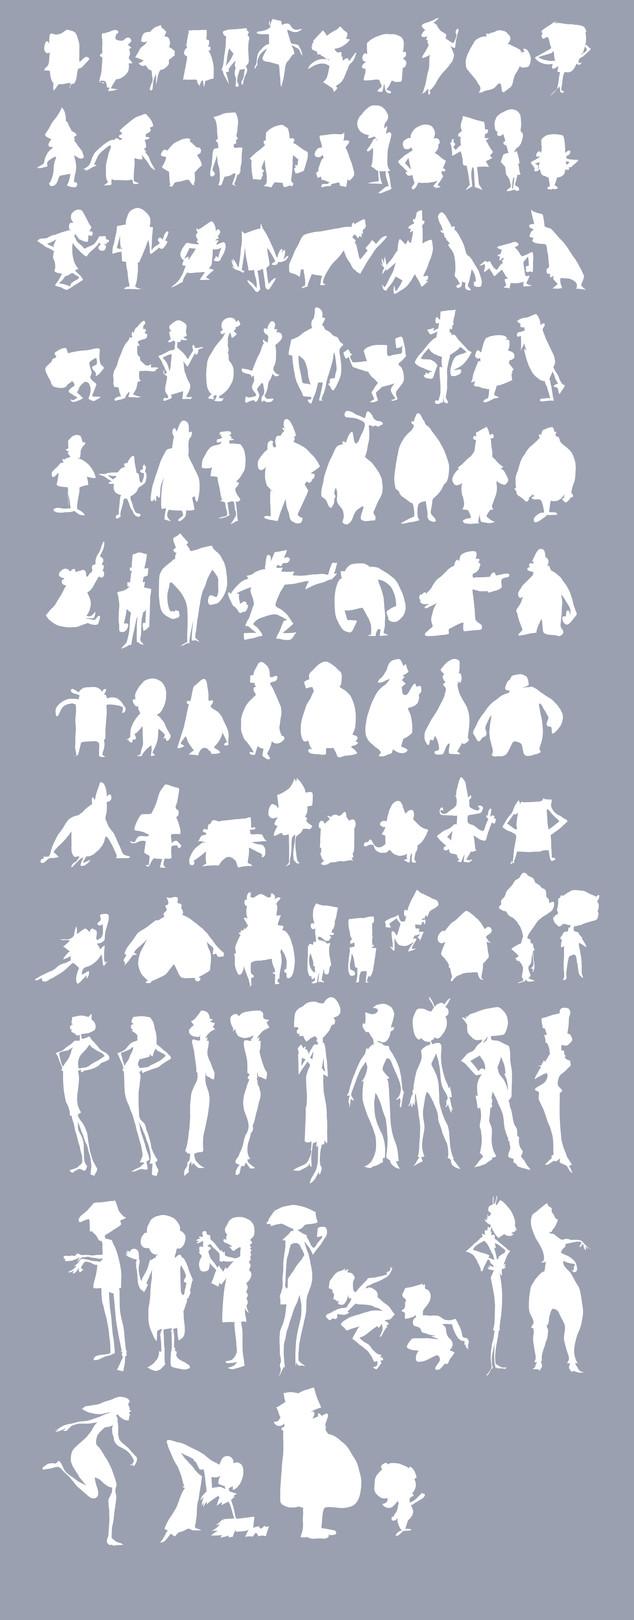 CharacterSheet(sillouette).jpg